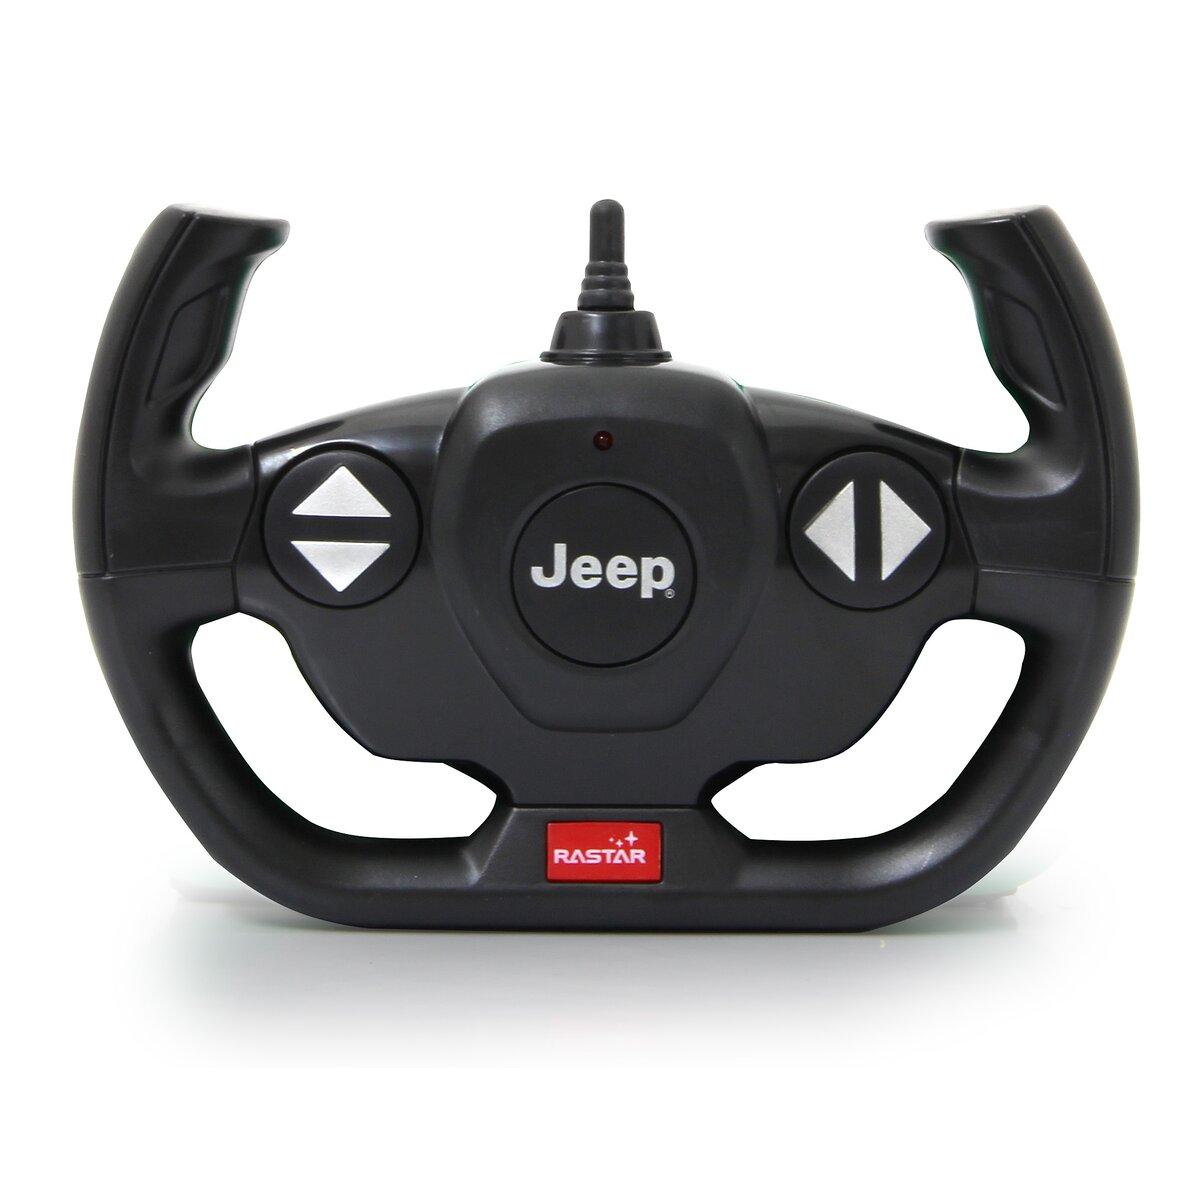 Jamara Jeep Wrangler JL 1:14 door manual červený 2,4G B